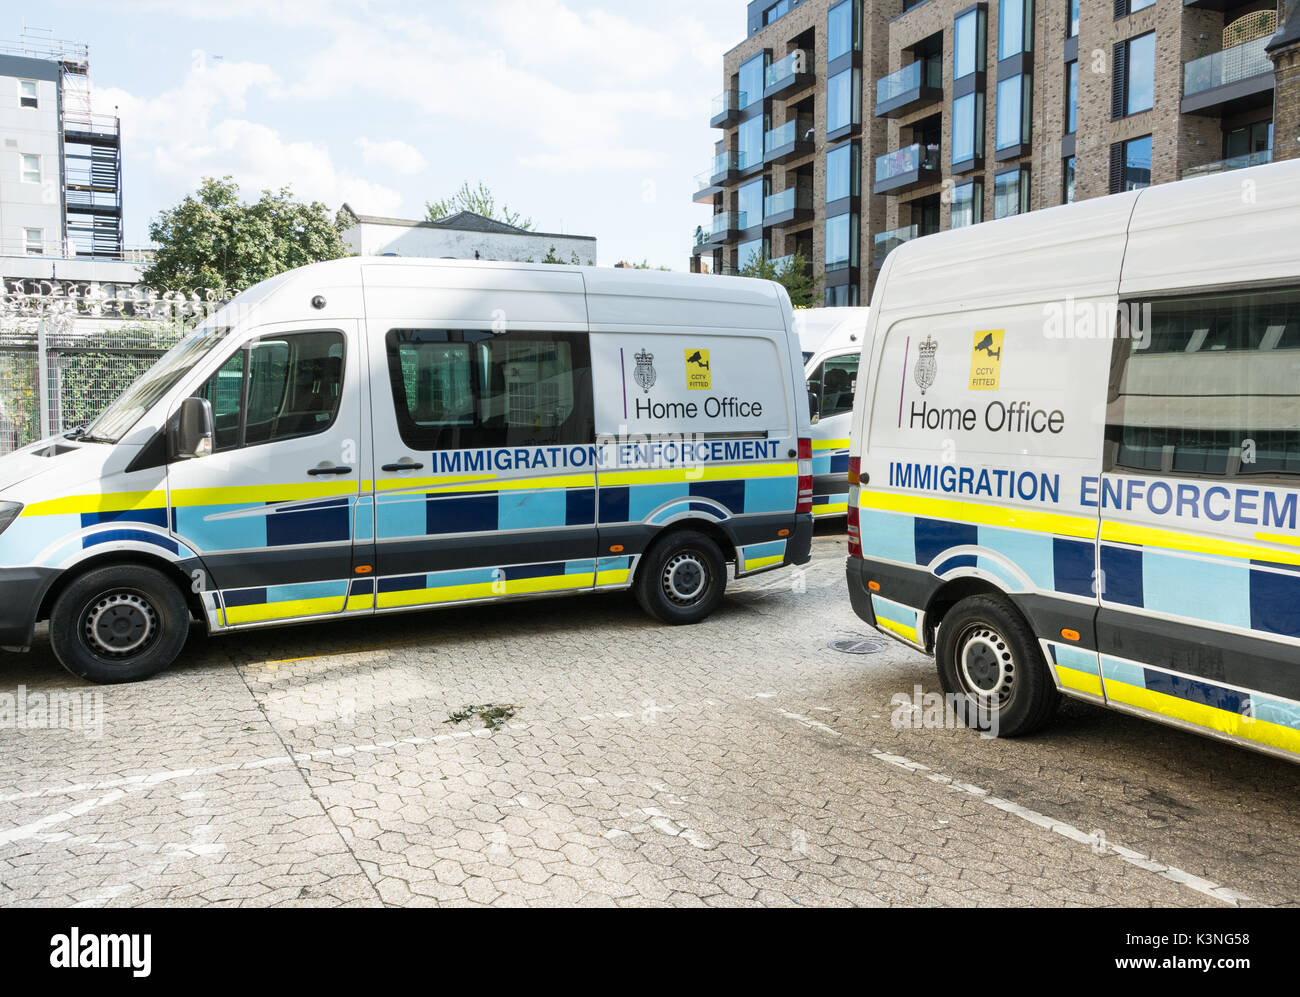 Home Office Immigration enforcement vehicles in Southwark, London, SE1, U.K. Stock Photo